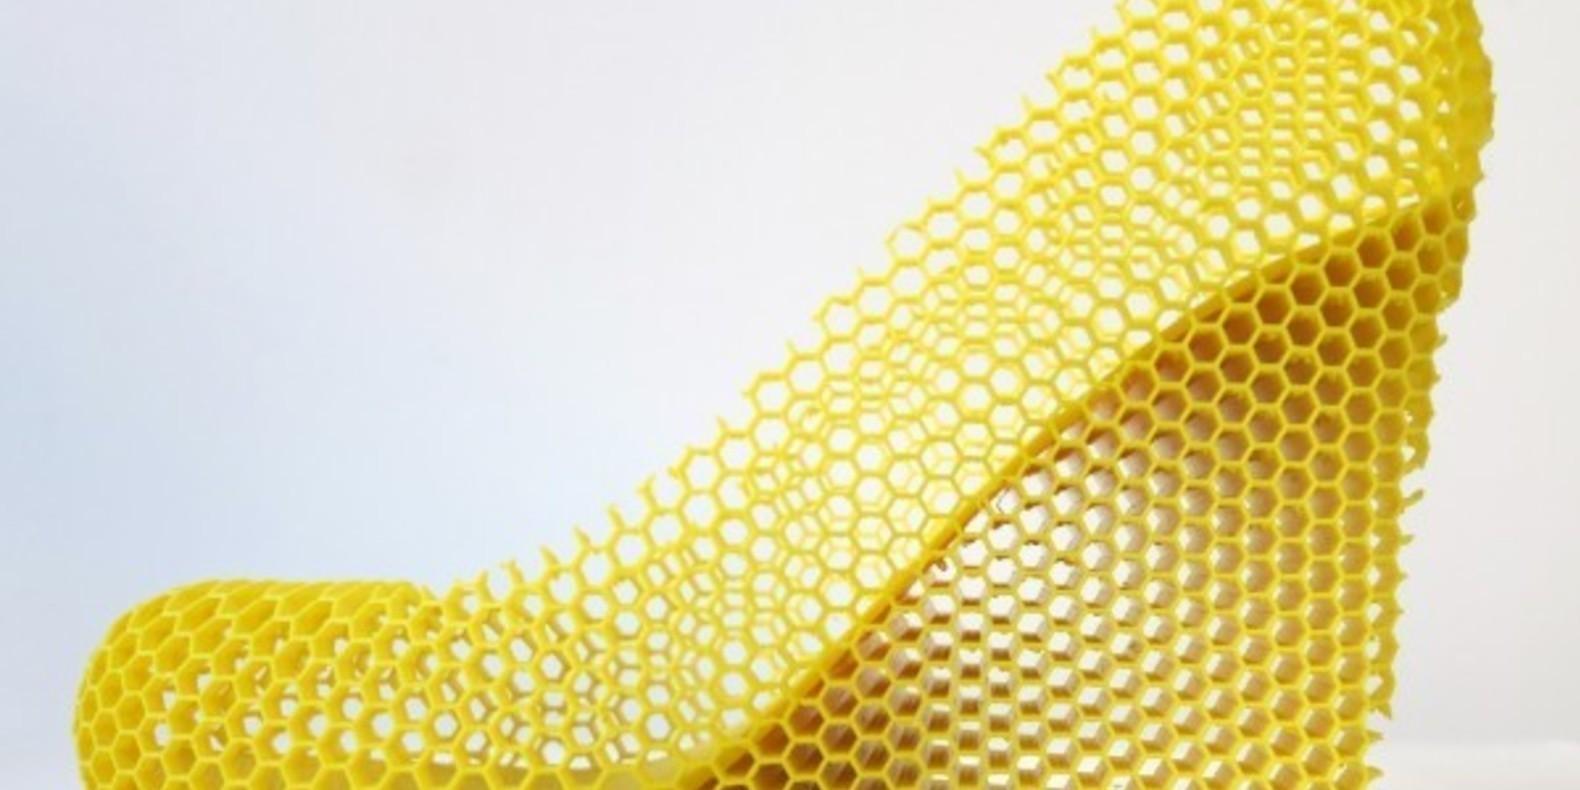 sebastian errazuriz shoe 3D print cults chaussures imprimees en 3D makerbot melissa designer 3D 2